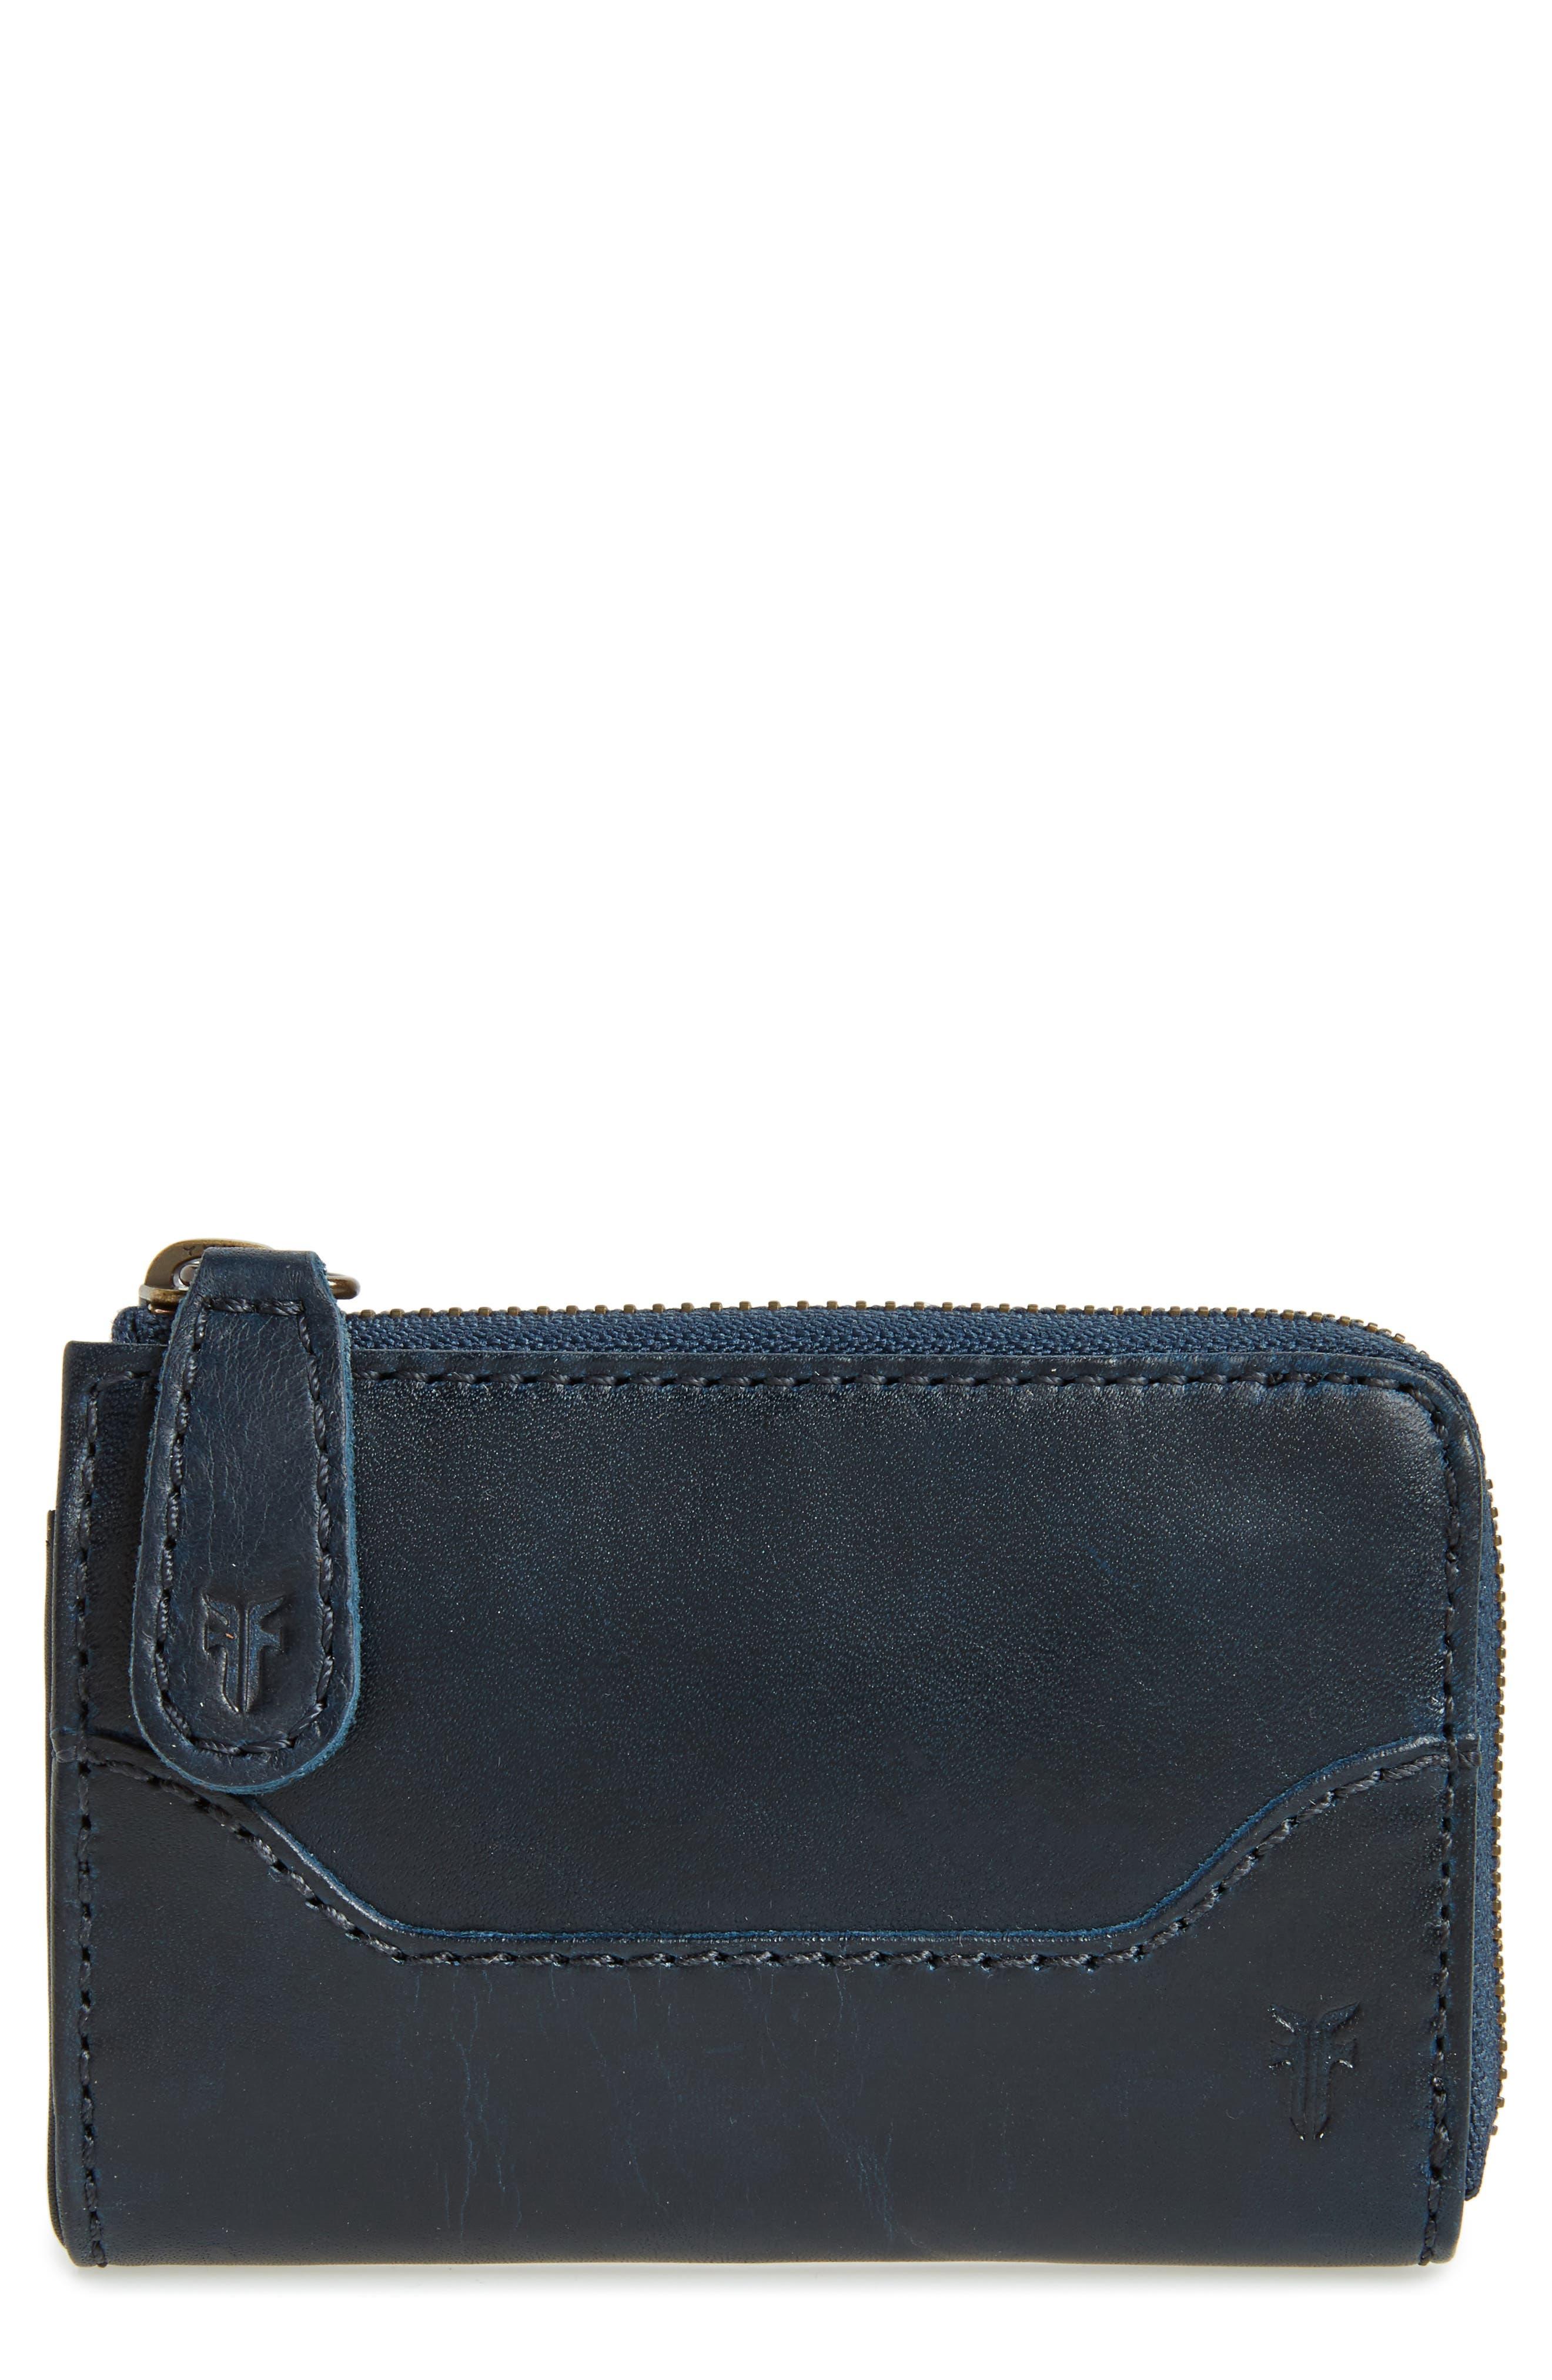 Frye Small Melissa Leather Zip Wallet